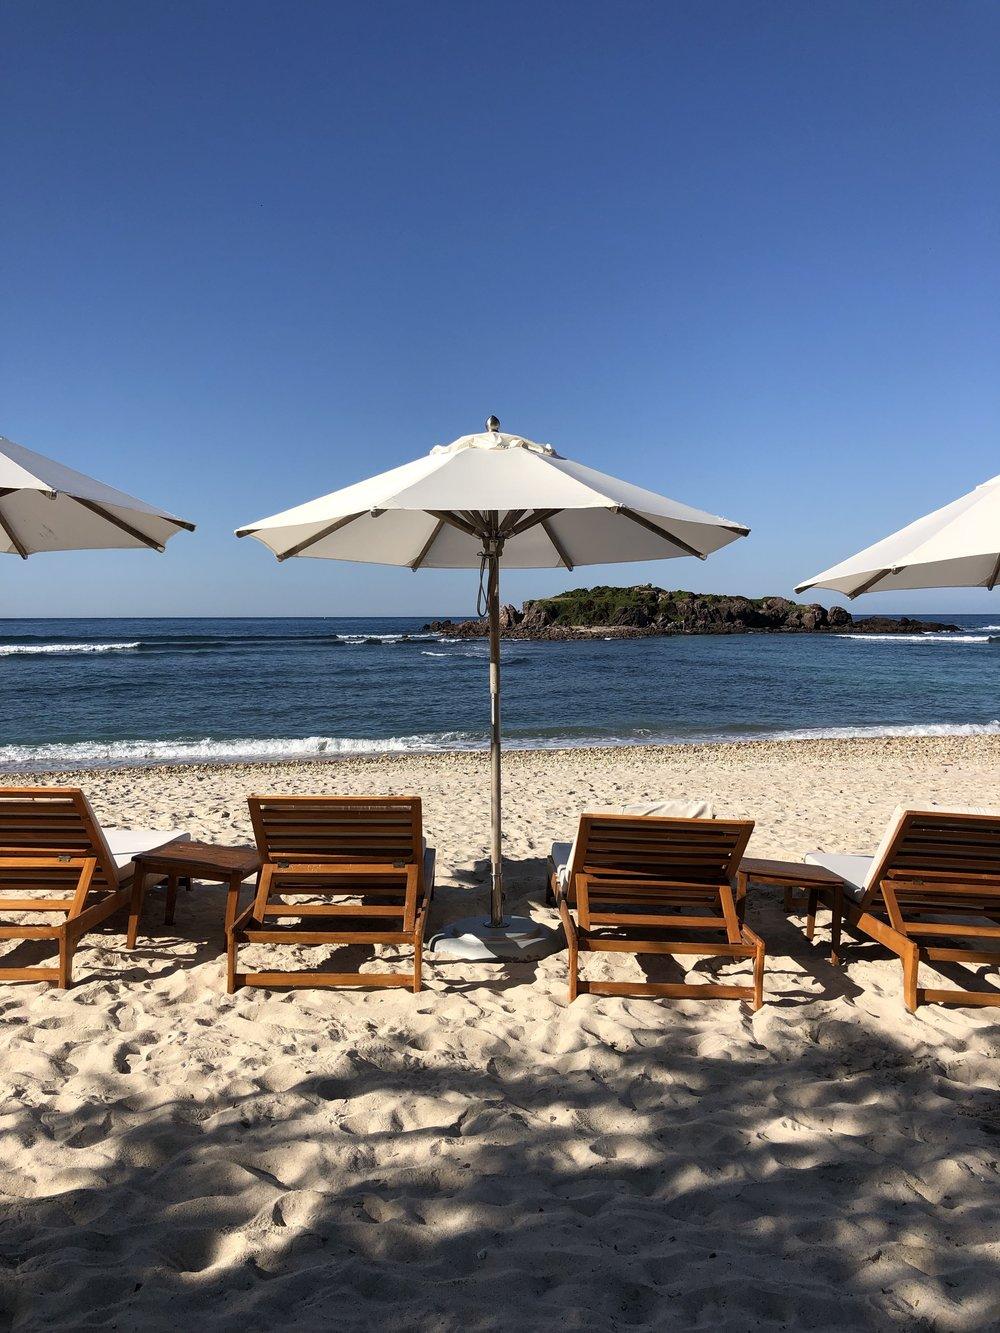 where to stay: St. Regis Punta Mita, Nayarit, Mexico